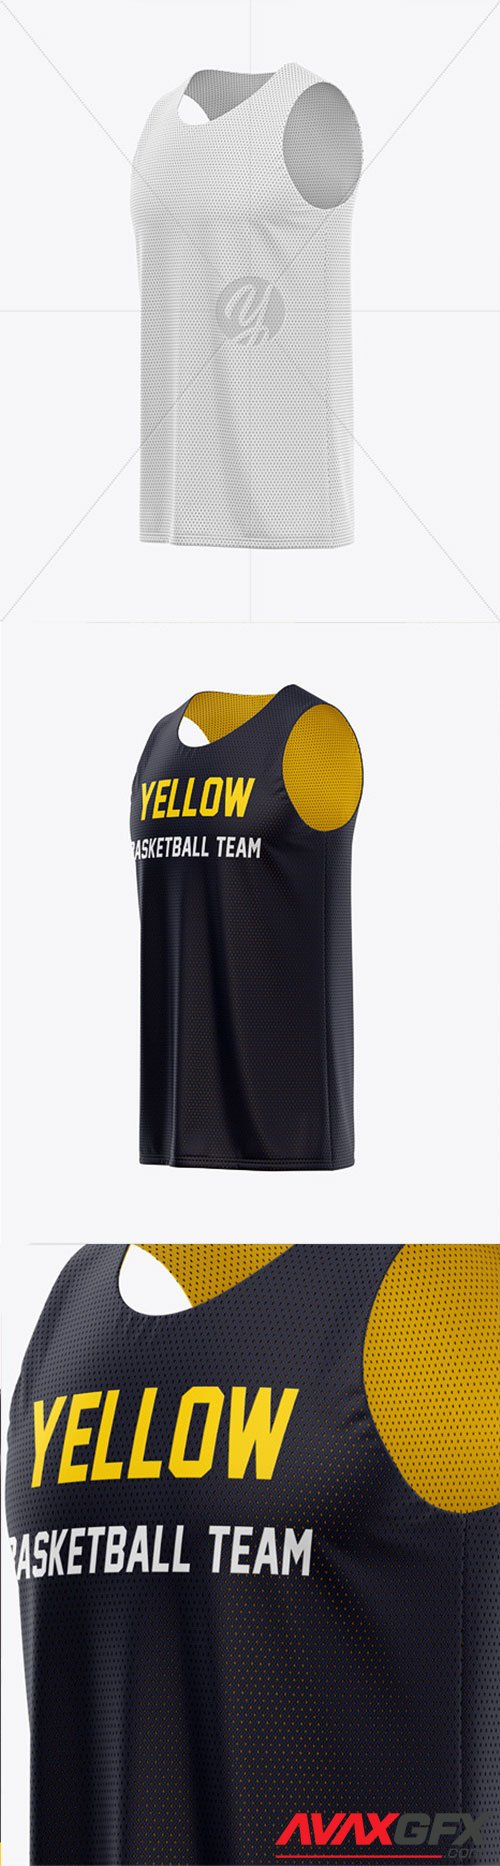 Download Men's Basketball Jersey Mockup - Side View 40533 TIF ...